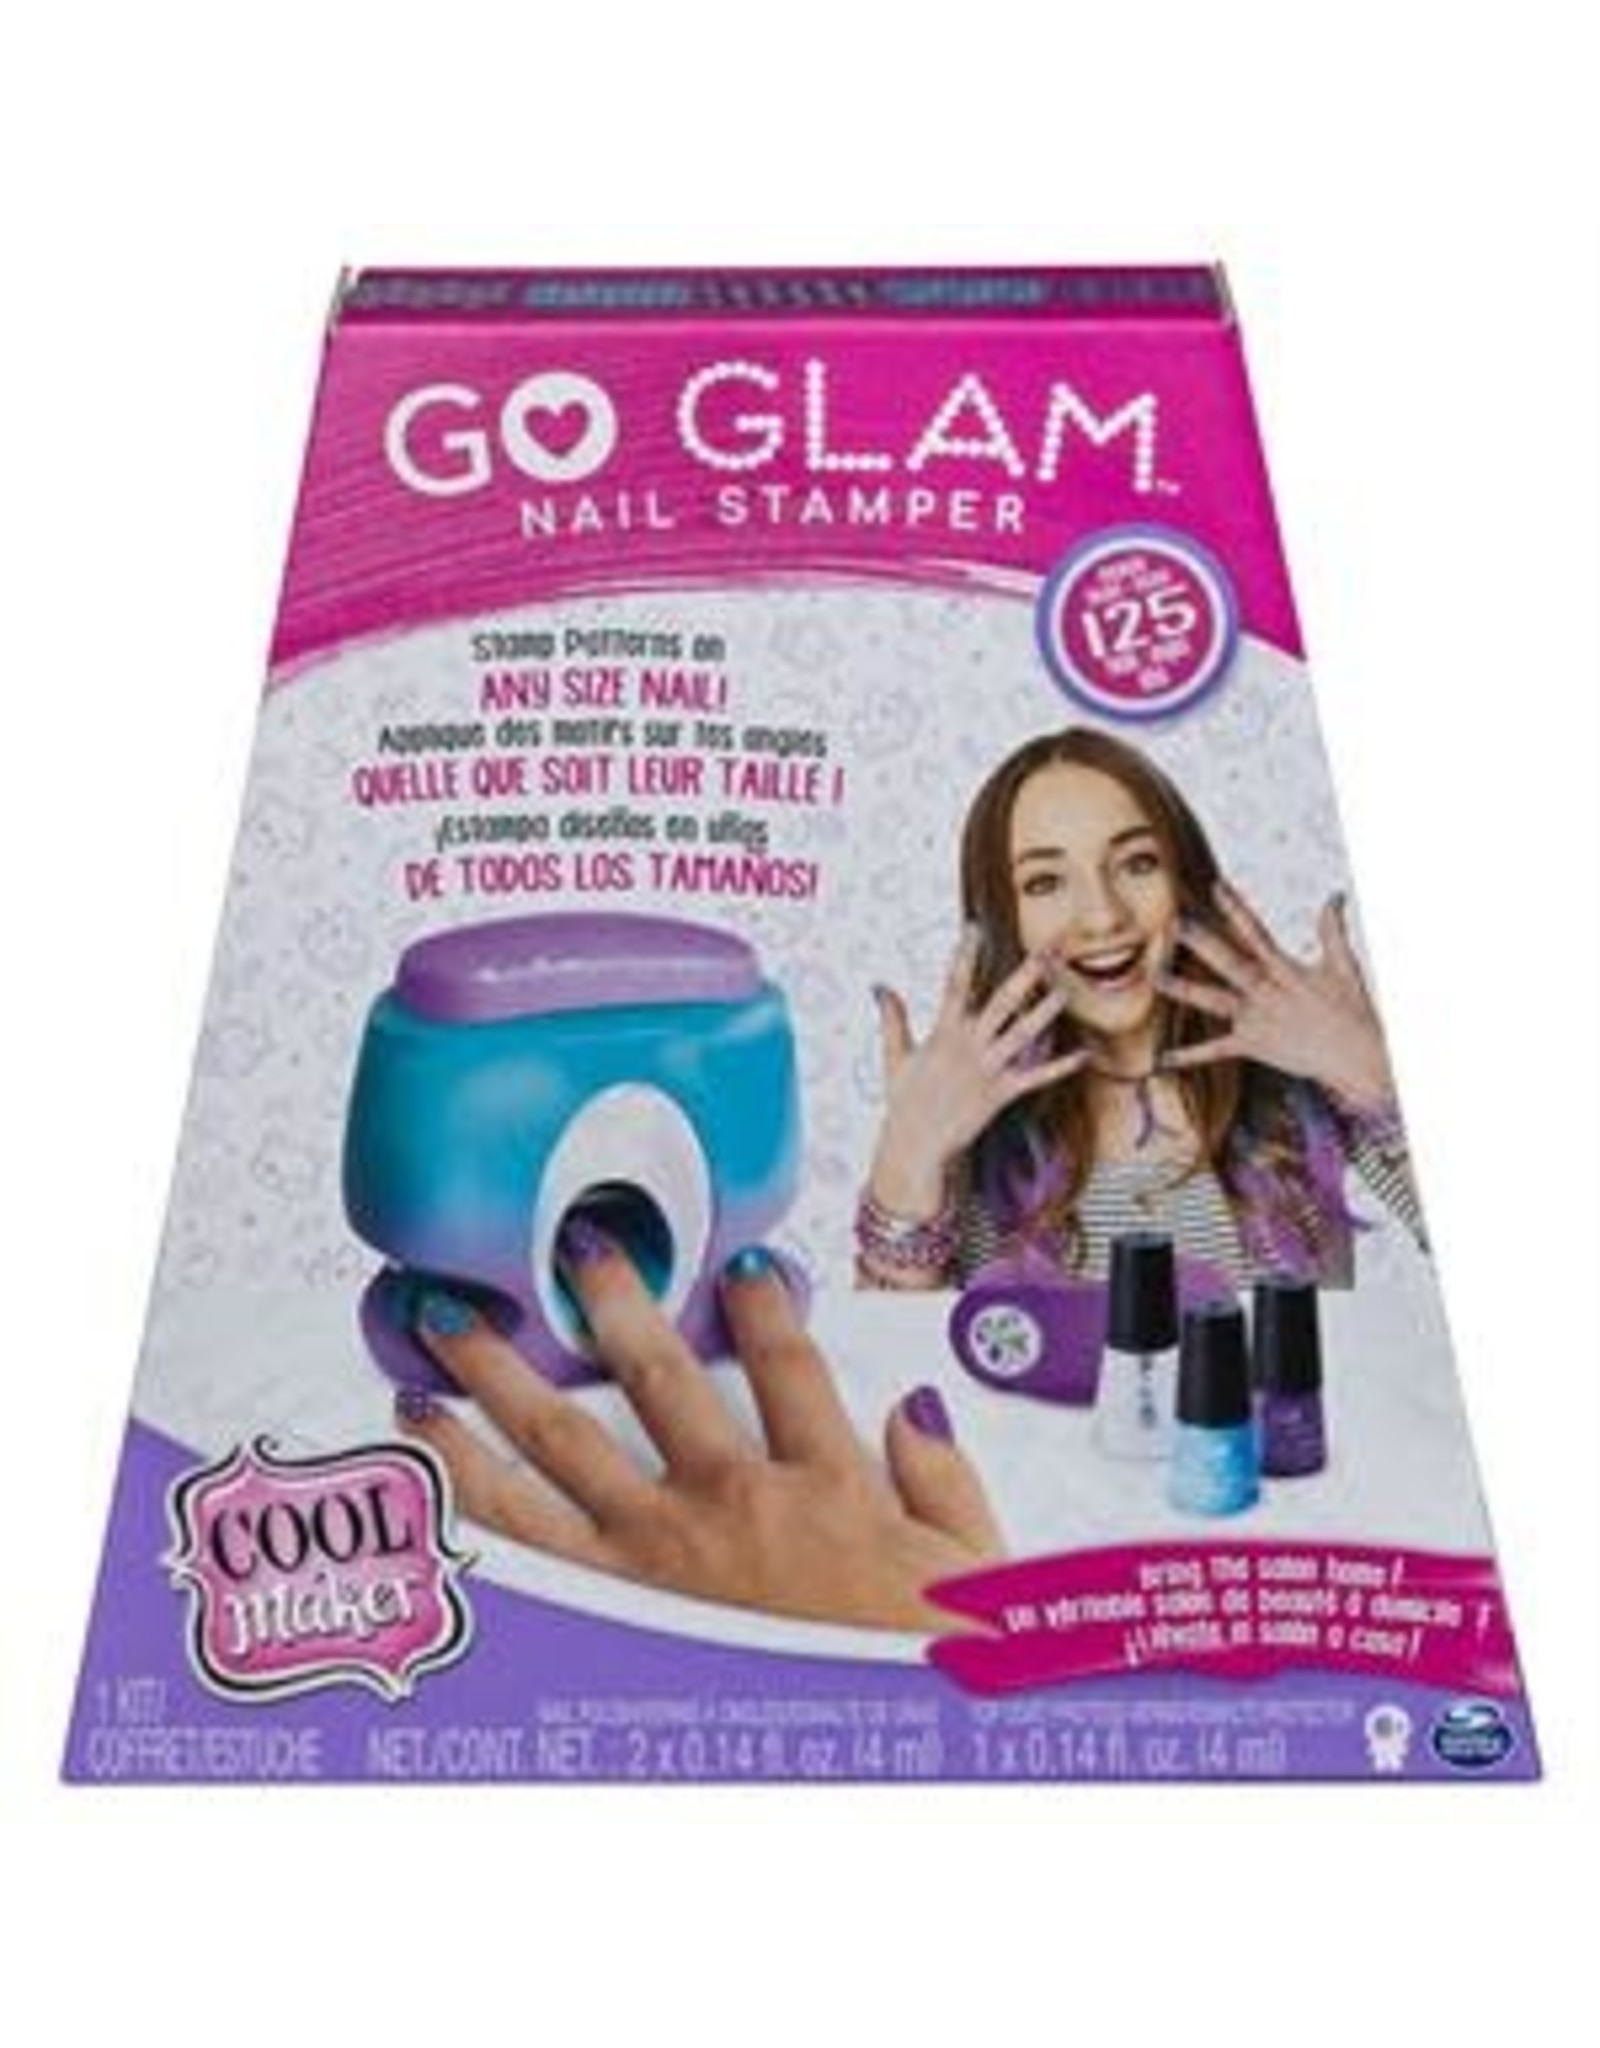 Gund/Spinmaster Cool Maker, GO GLAM Nail Stamper  Studio